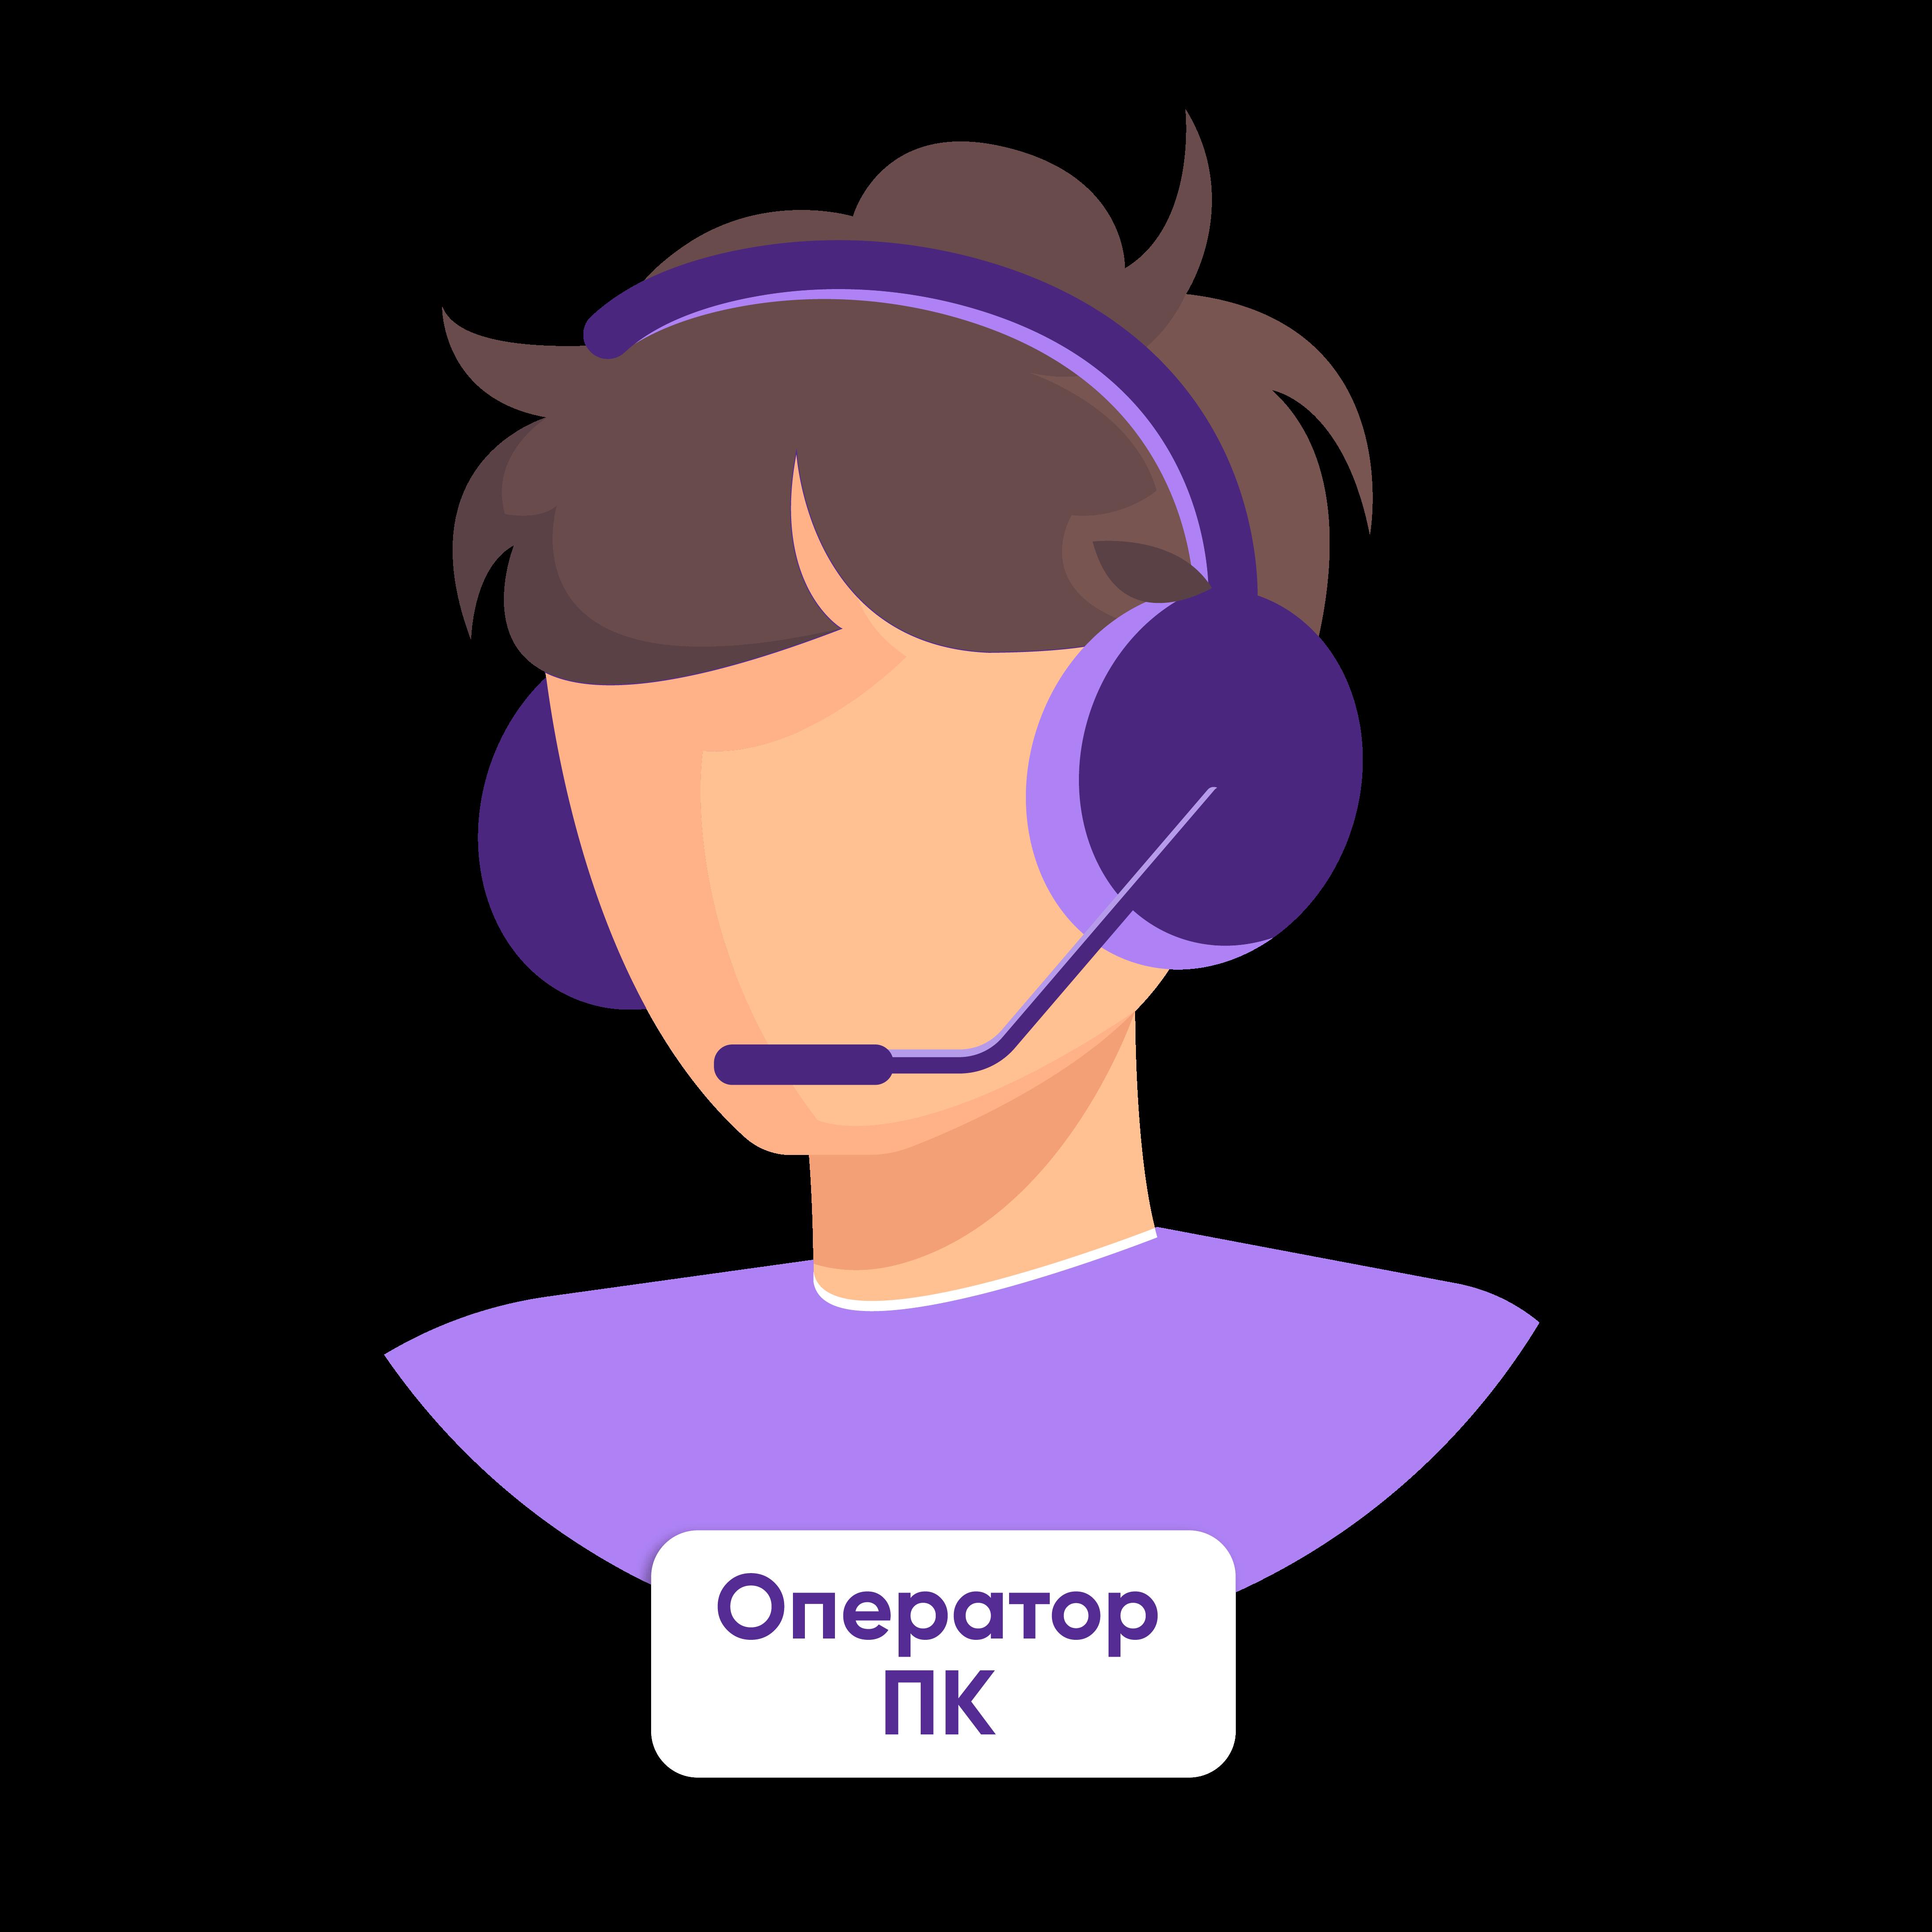 Оператор ПК (Начинающий специалист)